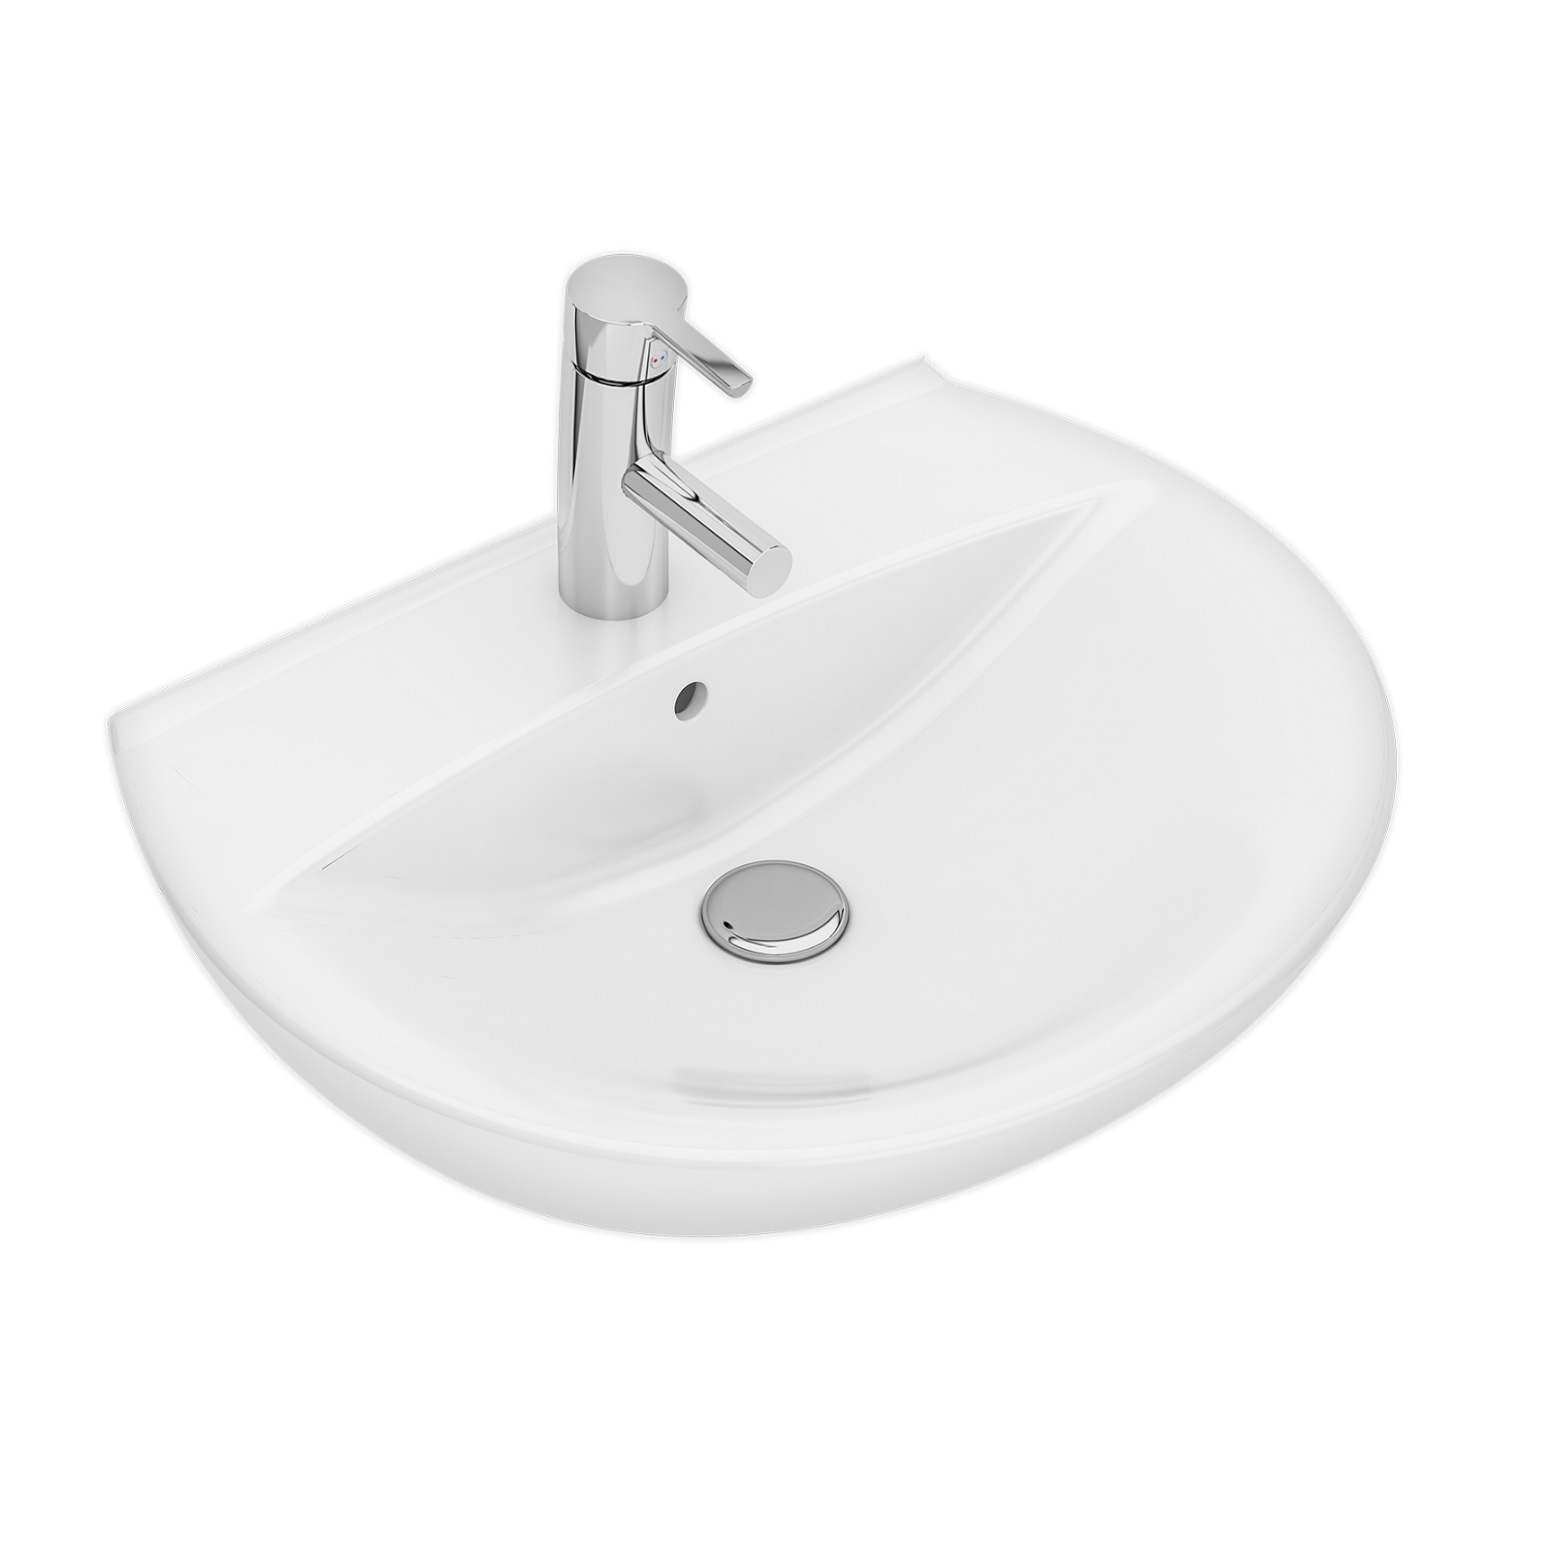 Tvättställ Ifö Spira 15122 57 cm